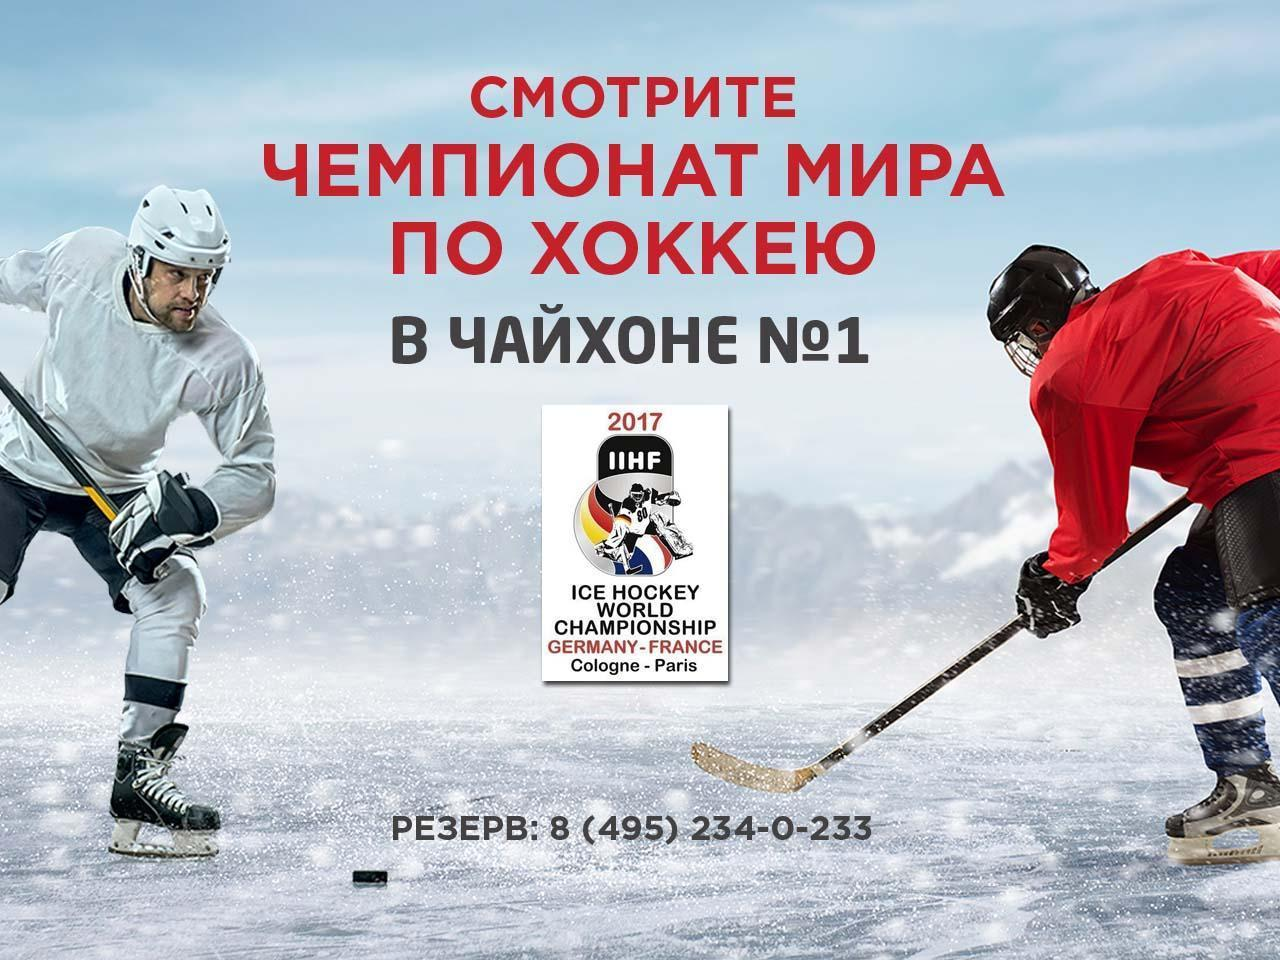 Хоккей в Чайхоне №1